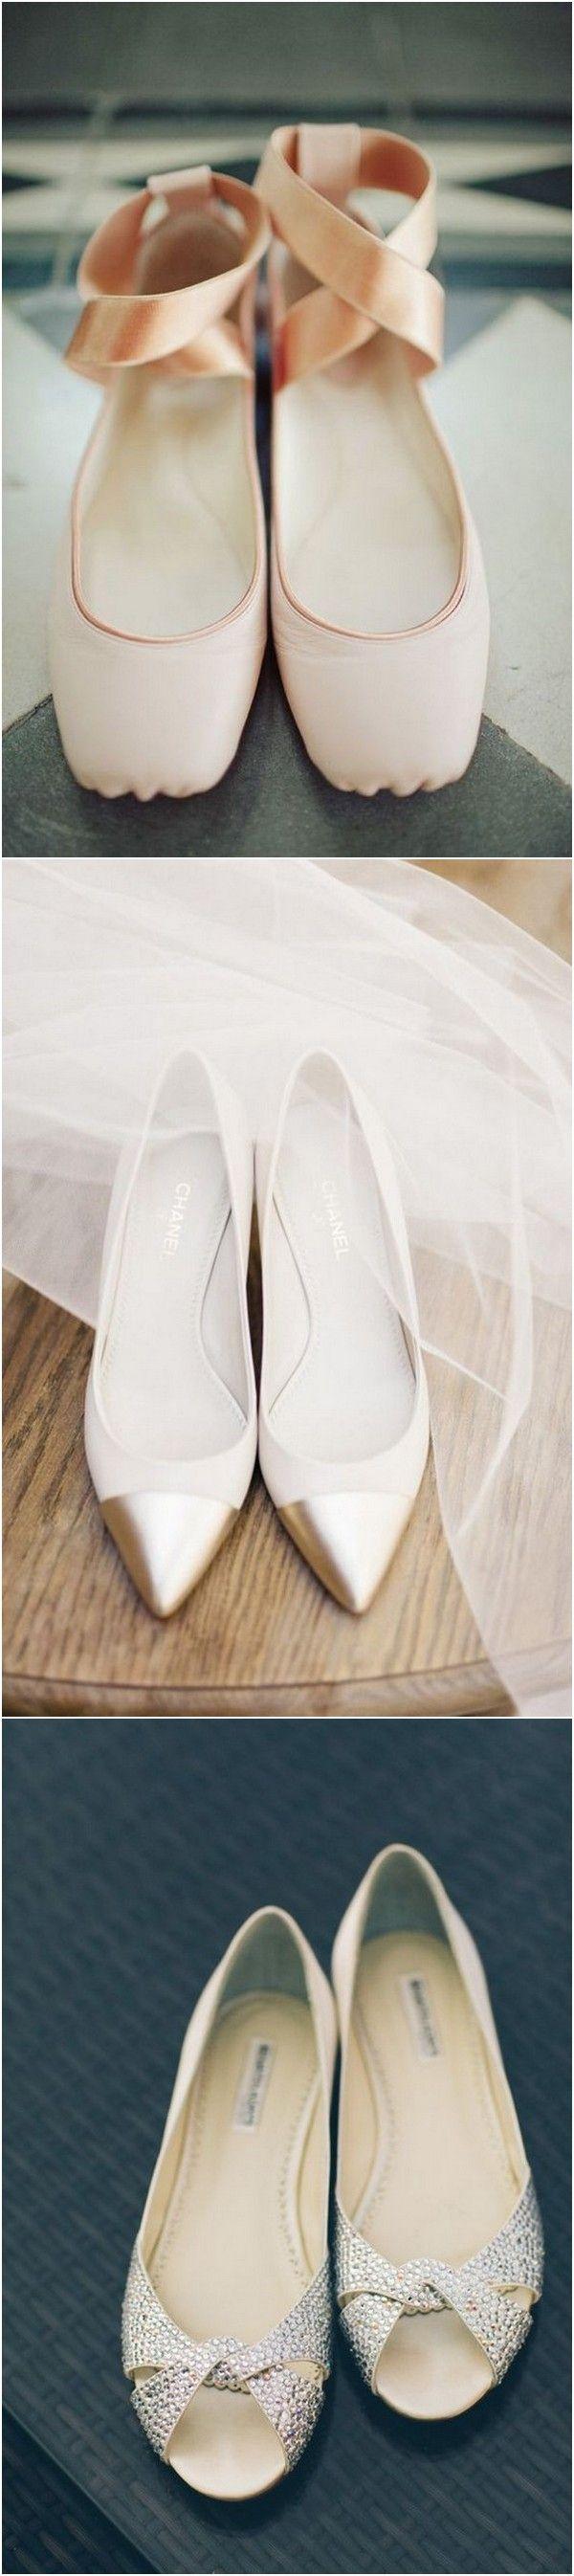 Elegant flat bridal wedding shoes #wedding #weddingshoes #weddingflats